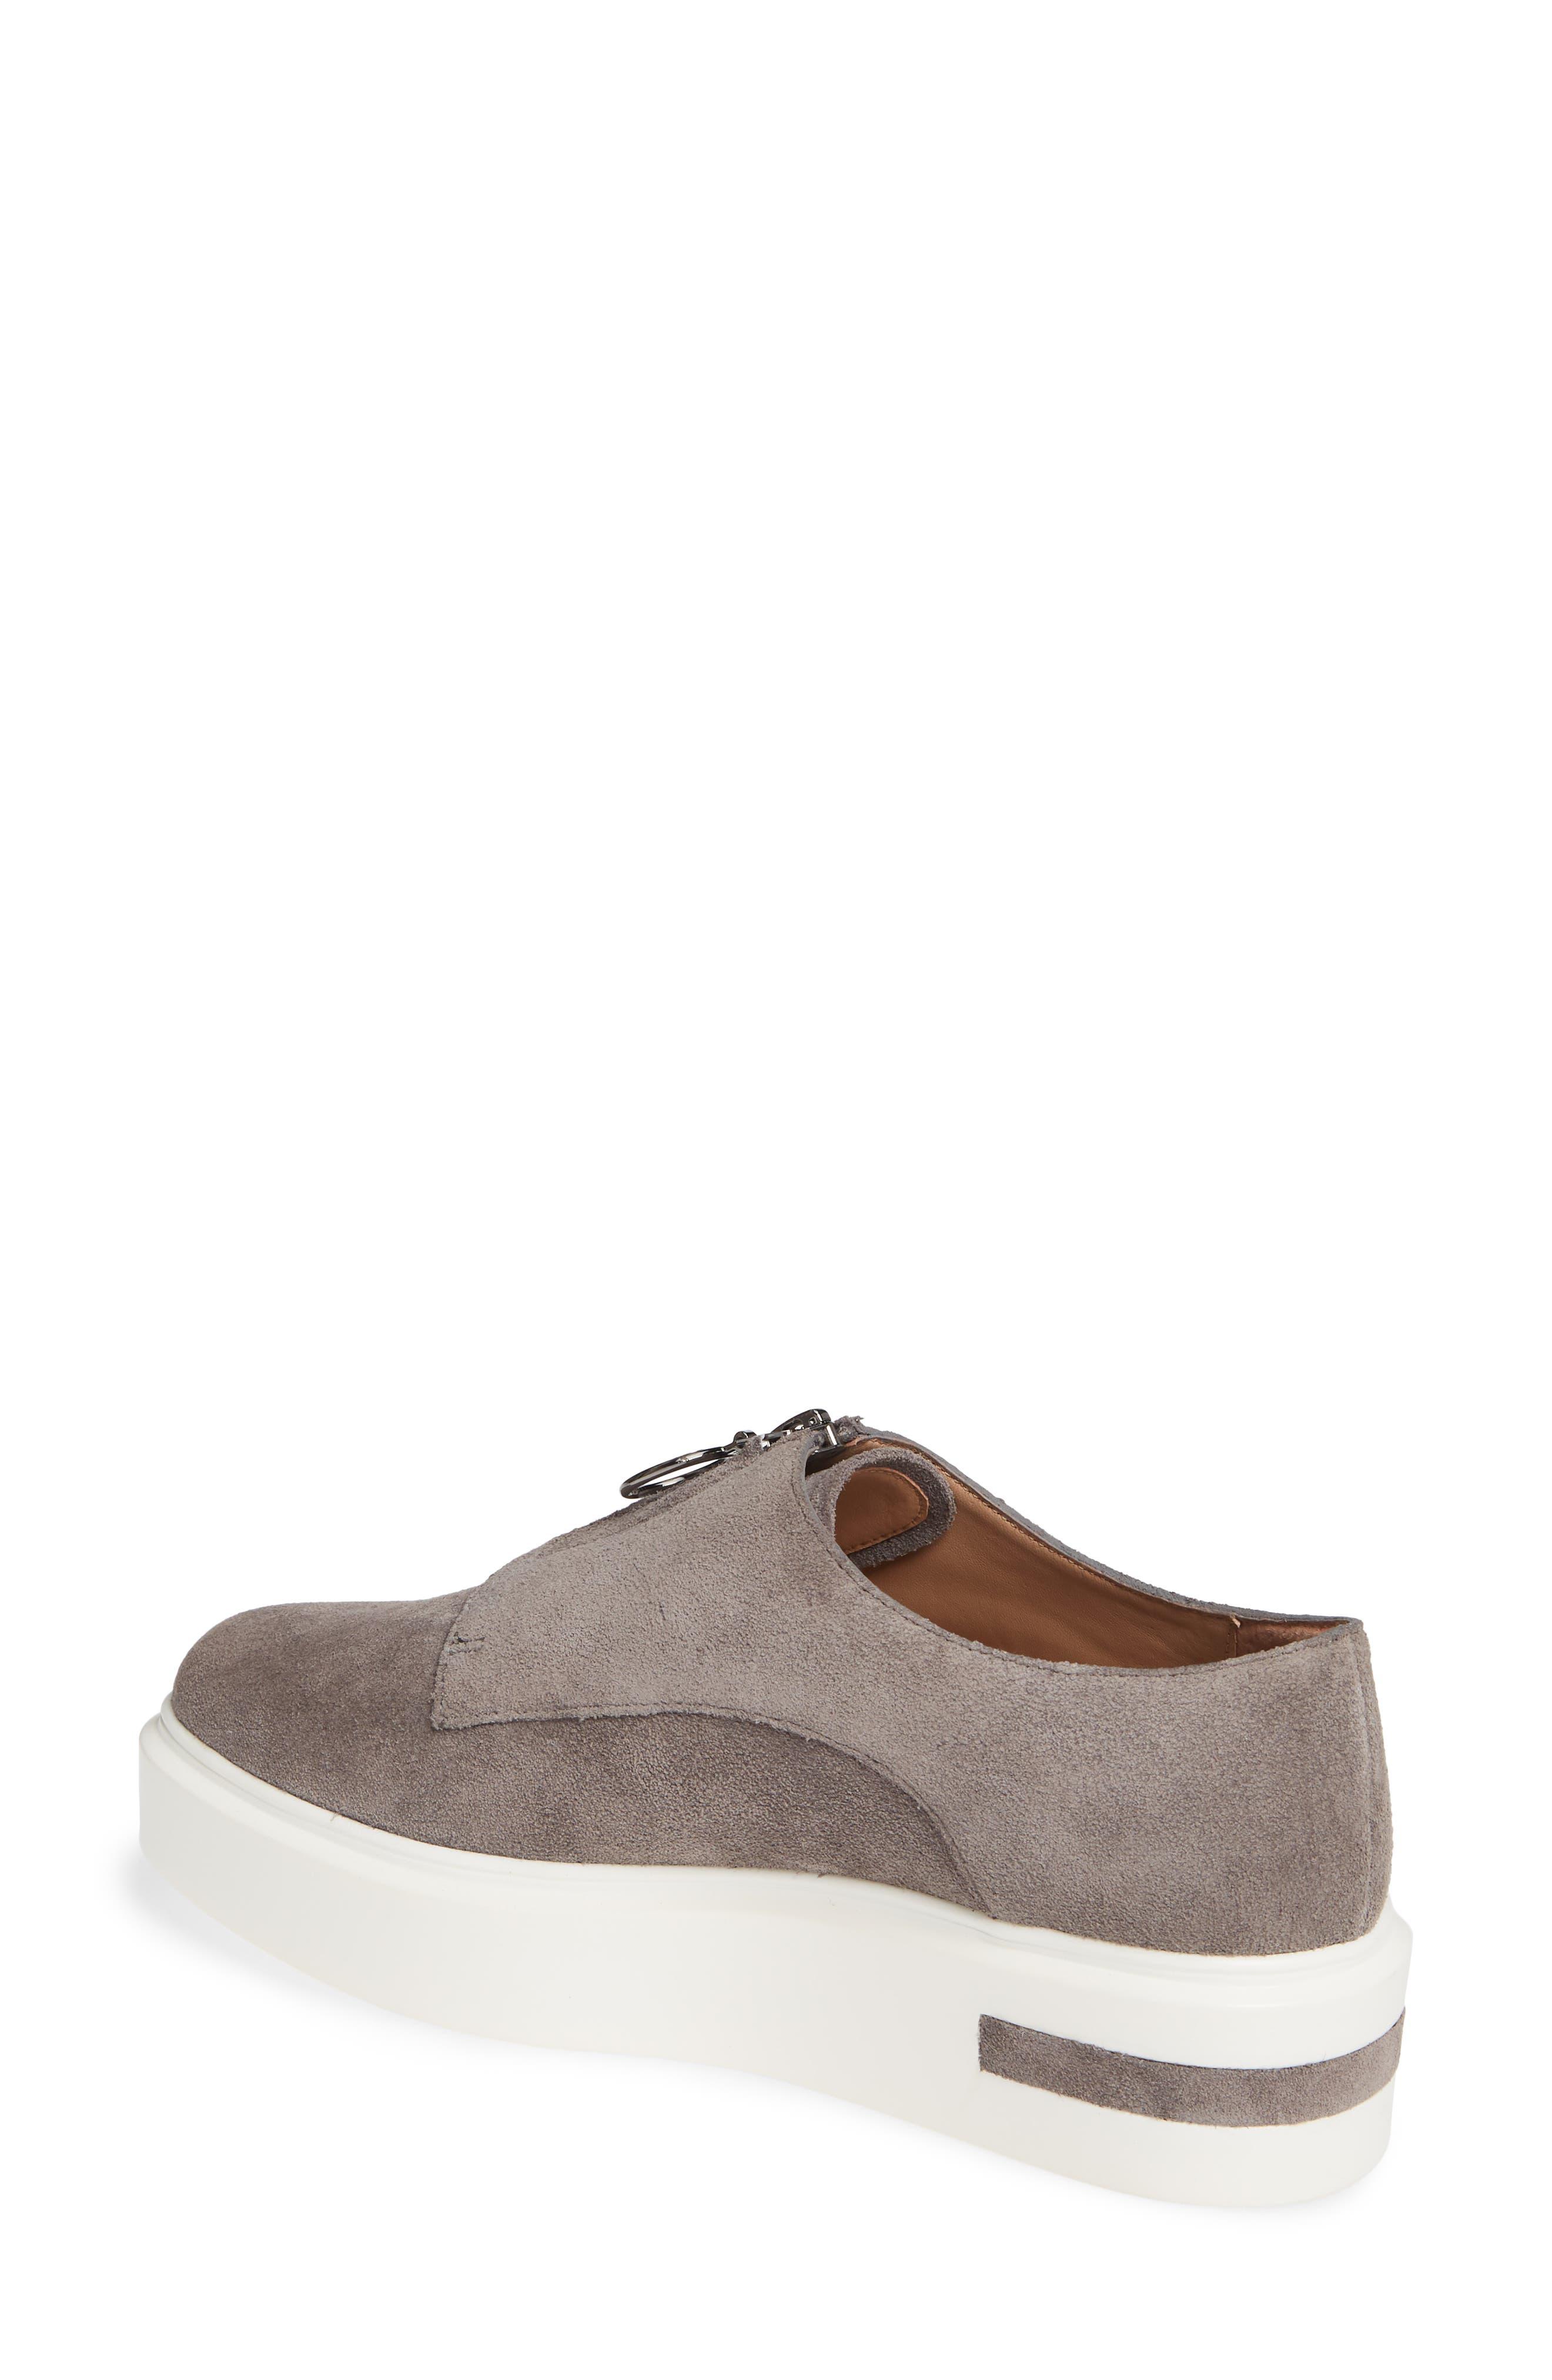 LINEA PAOLO, Kelani Platform Sneaker, Alternate thumbnail 2, color, STONE SUEDE